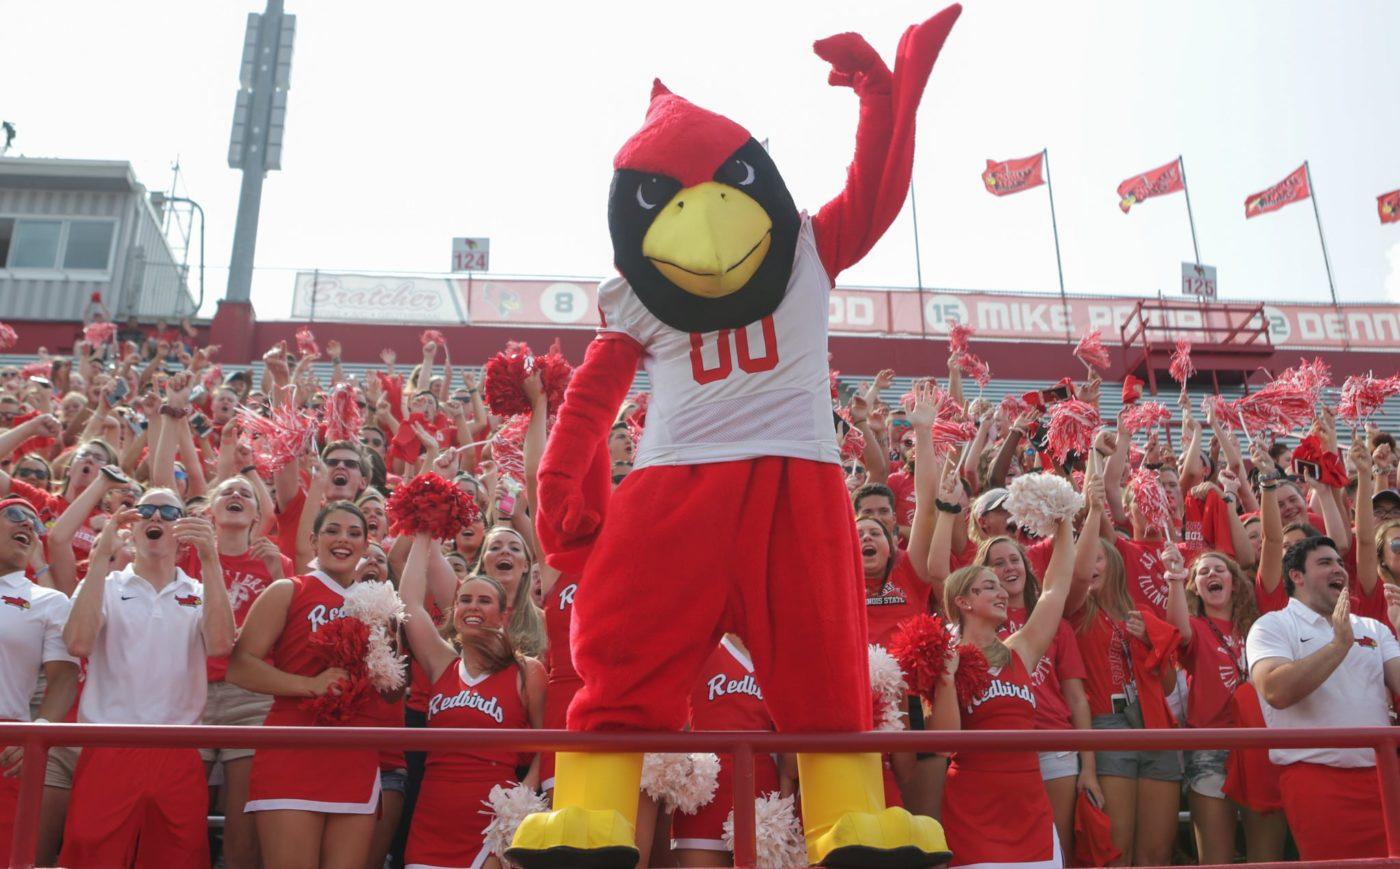 Reggie Red Bird 3